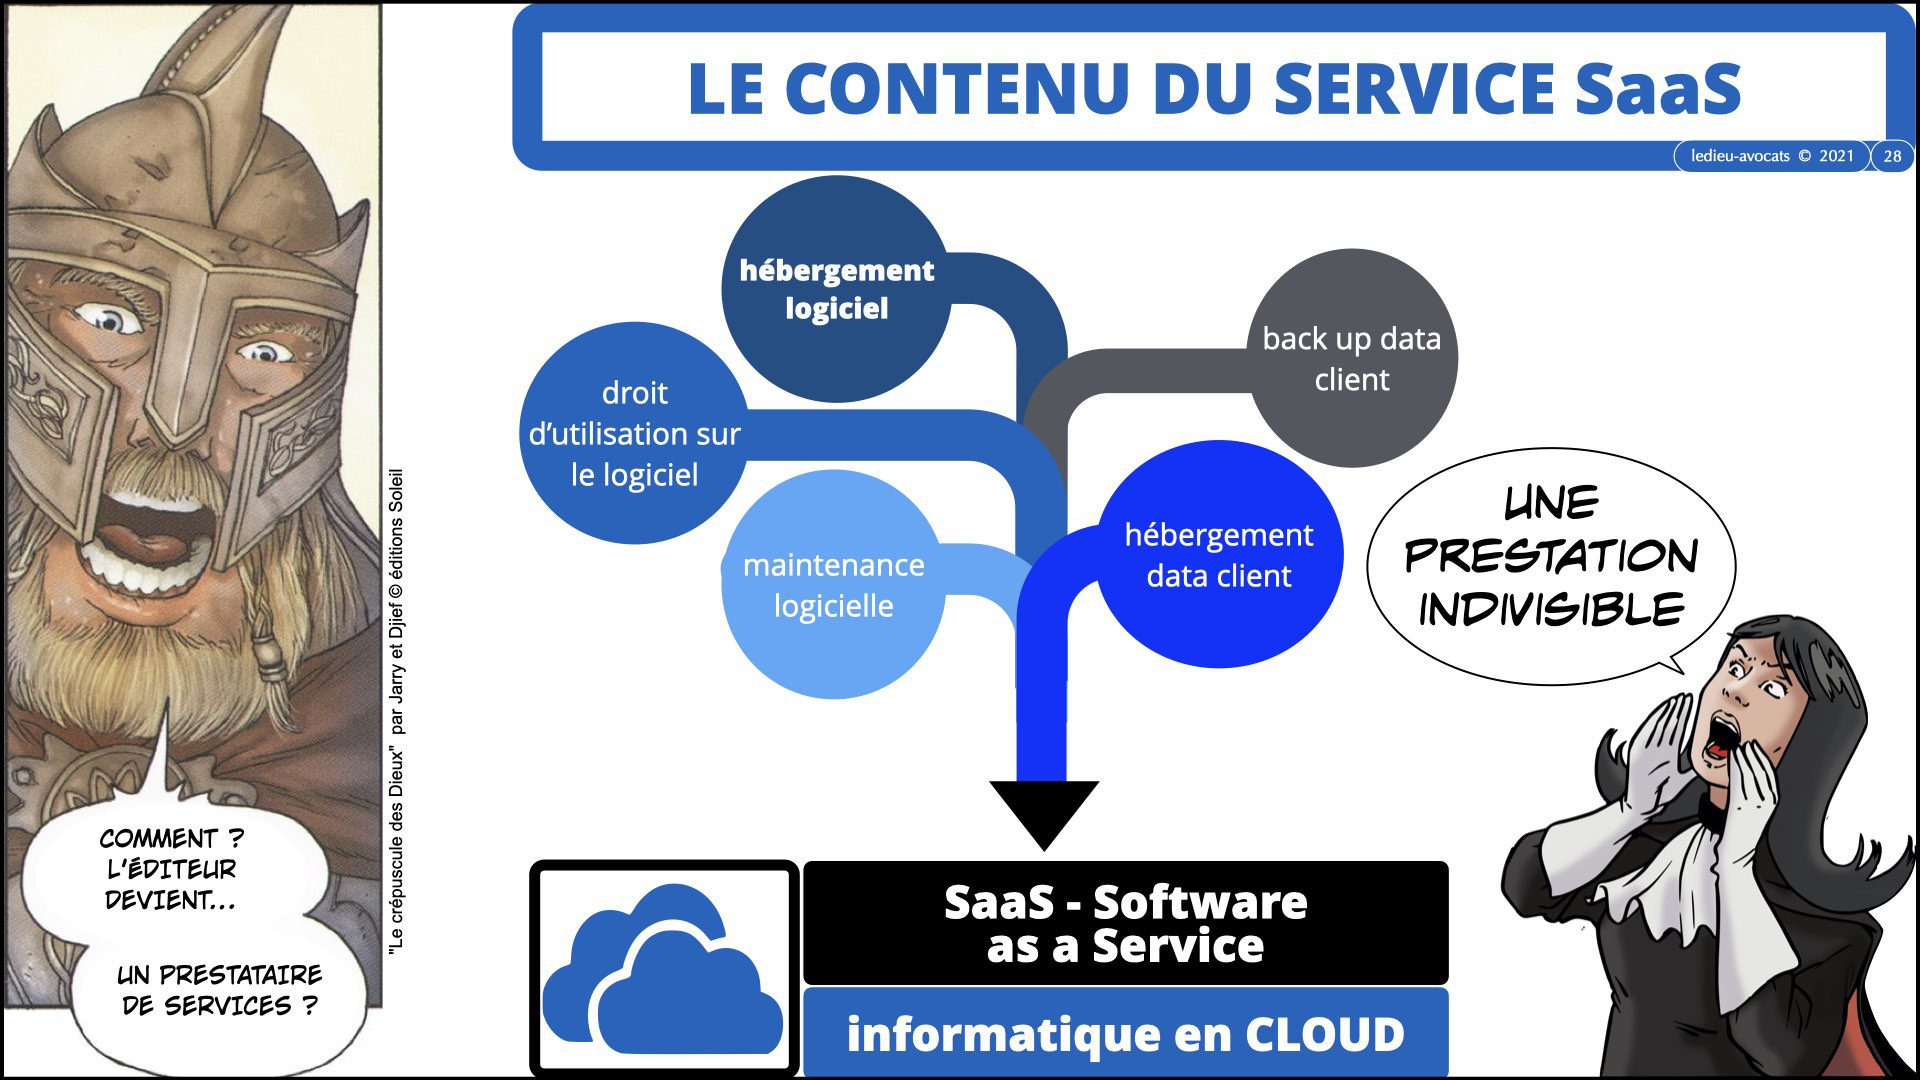 service logiciel SaaS 2021 : le contenu du service